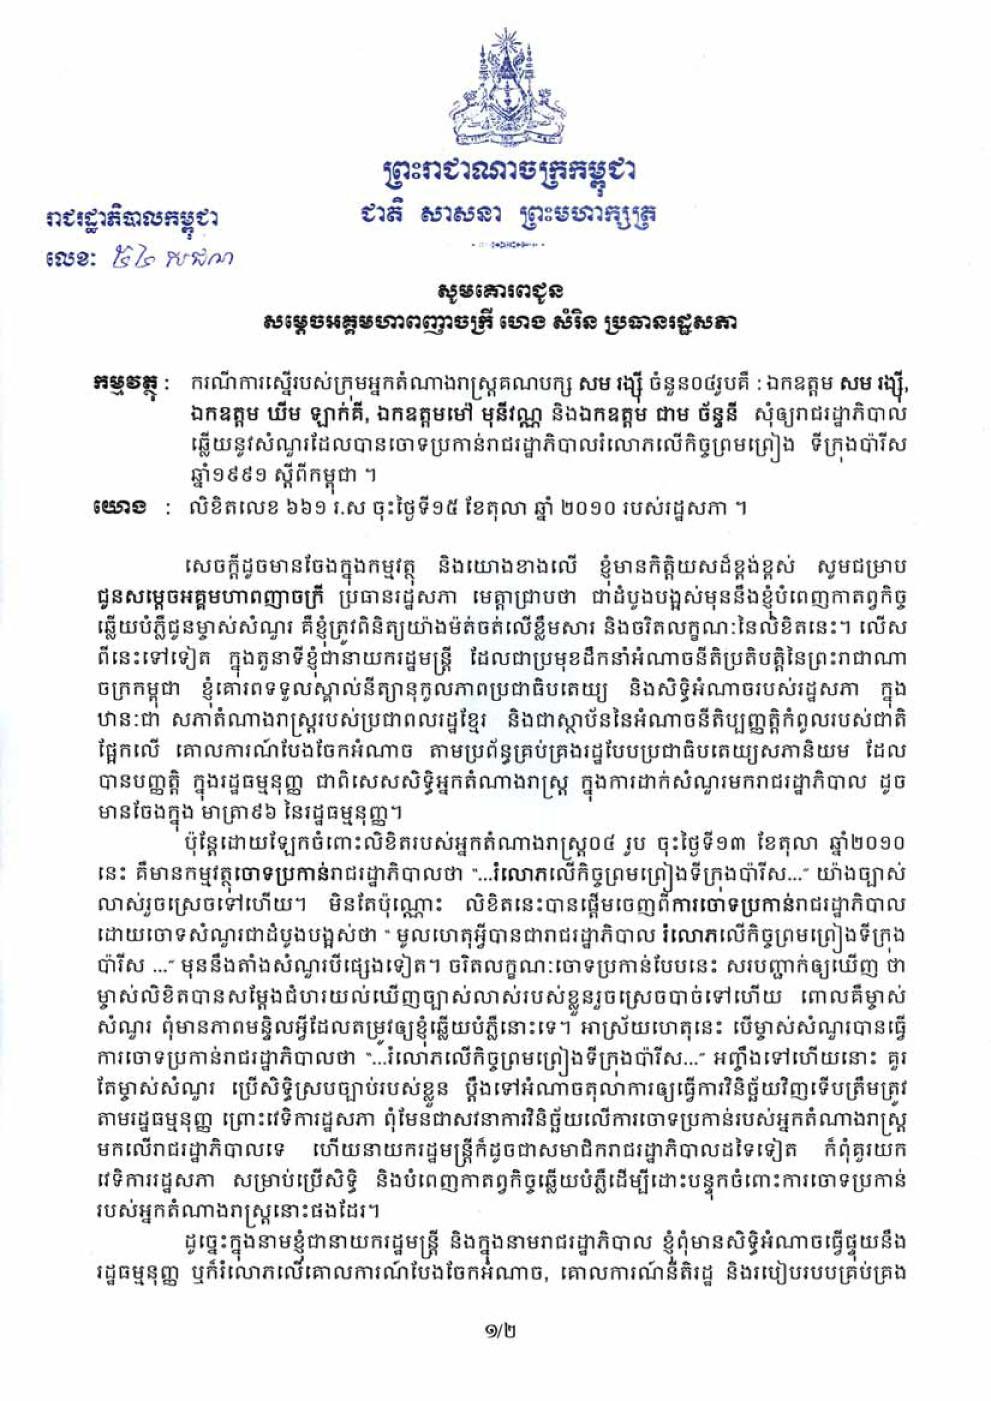 Editorials On Cambodia Samdech Dejo Hun Sen Refuses To Answer Srp